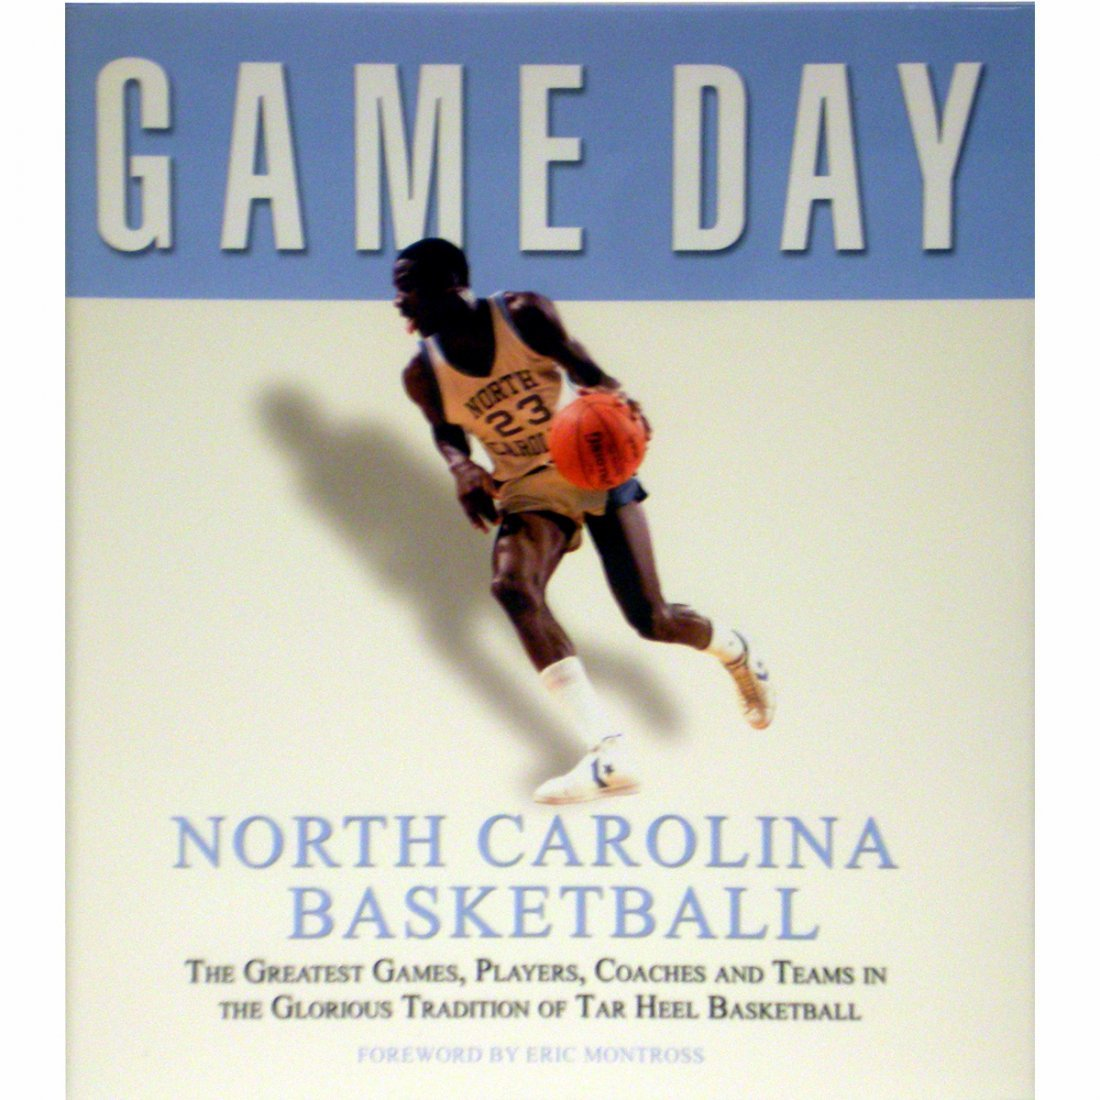 North Carolina Basketball Game Day Book